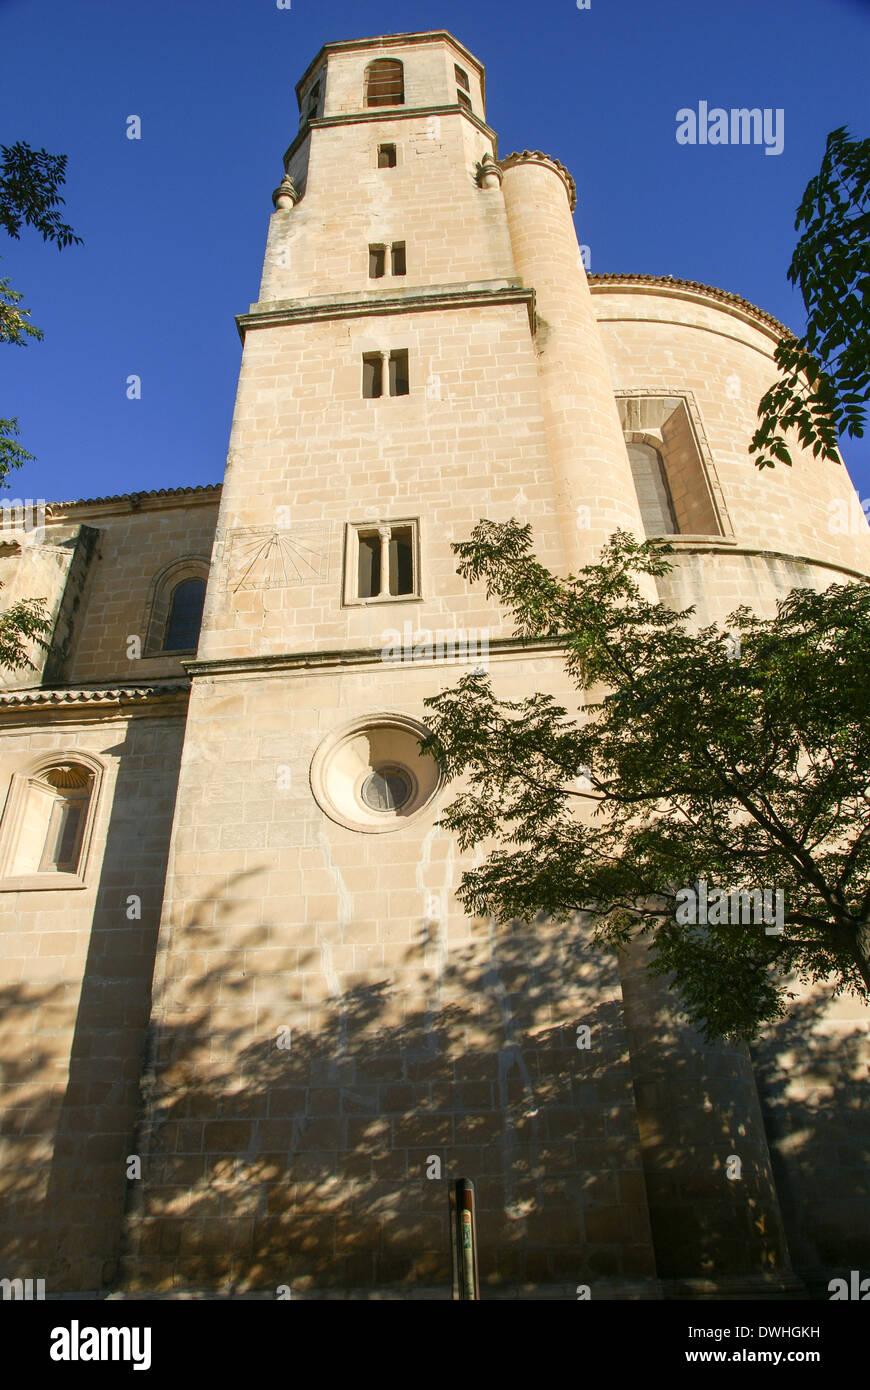 Ubeda, Jaen, Andalucia, Spain - Stock Image